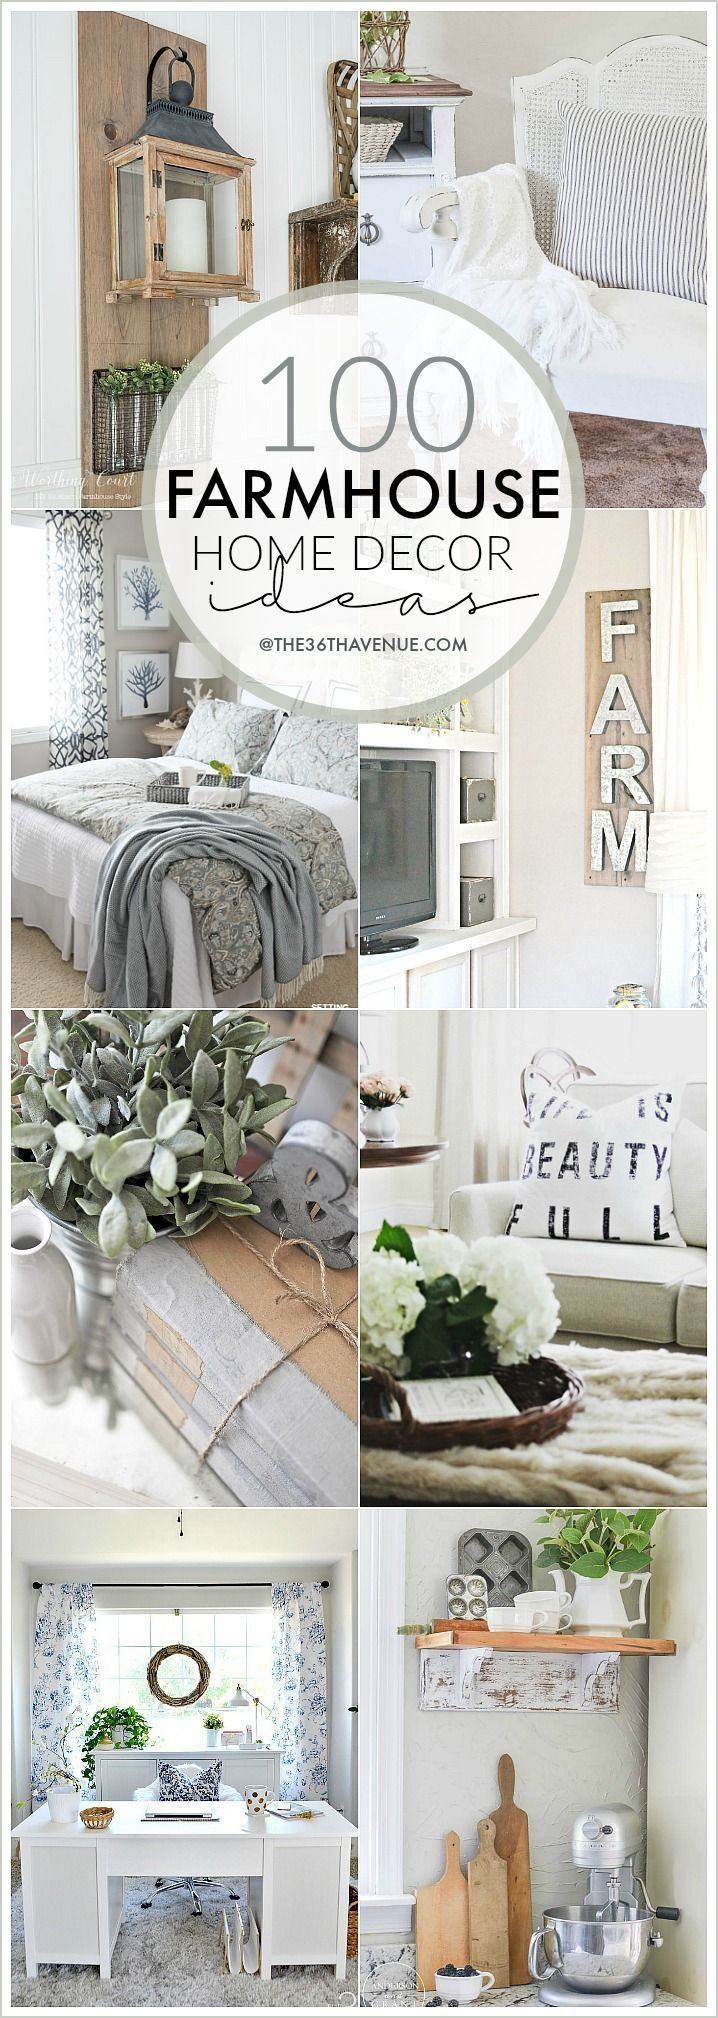 Home Decorating Ideas Interior Design: Best 25+ Home Decor Accessories Ideas On Pinterest